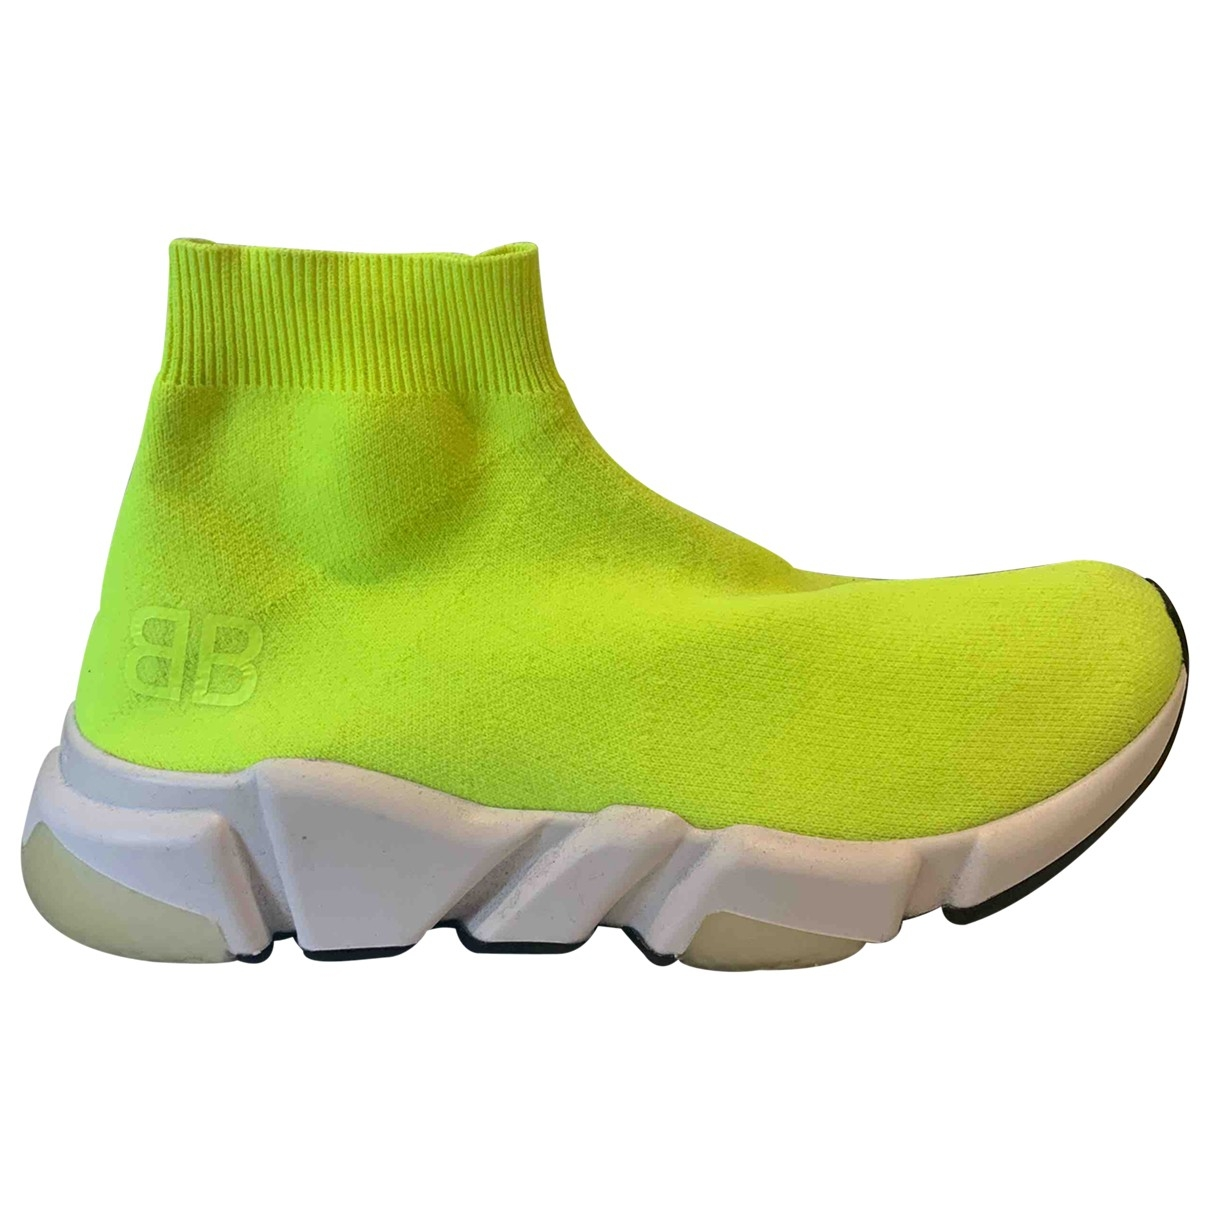 Balenciaga Speed Yellow Cloth Trainers for Women 37 EU